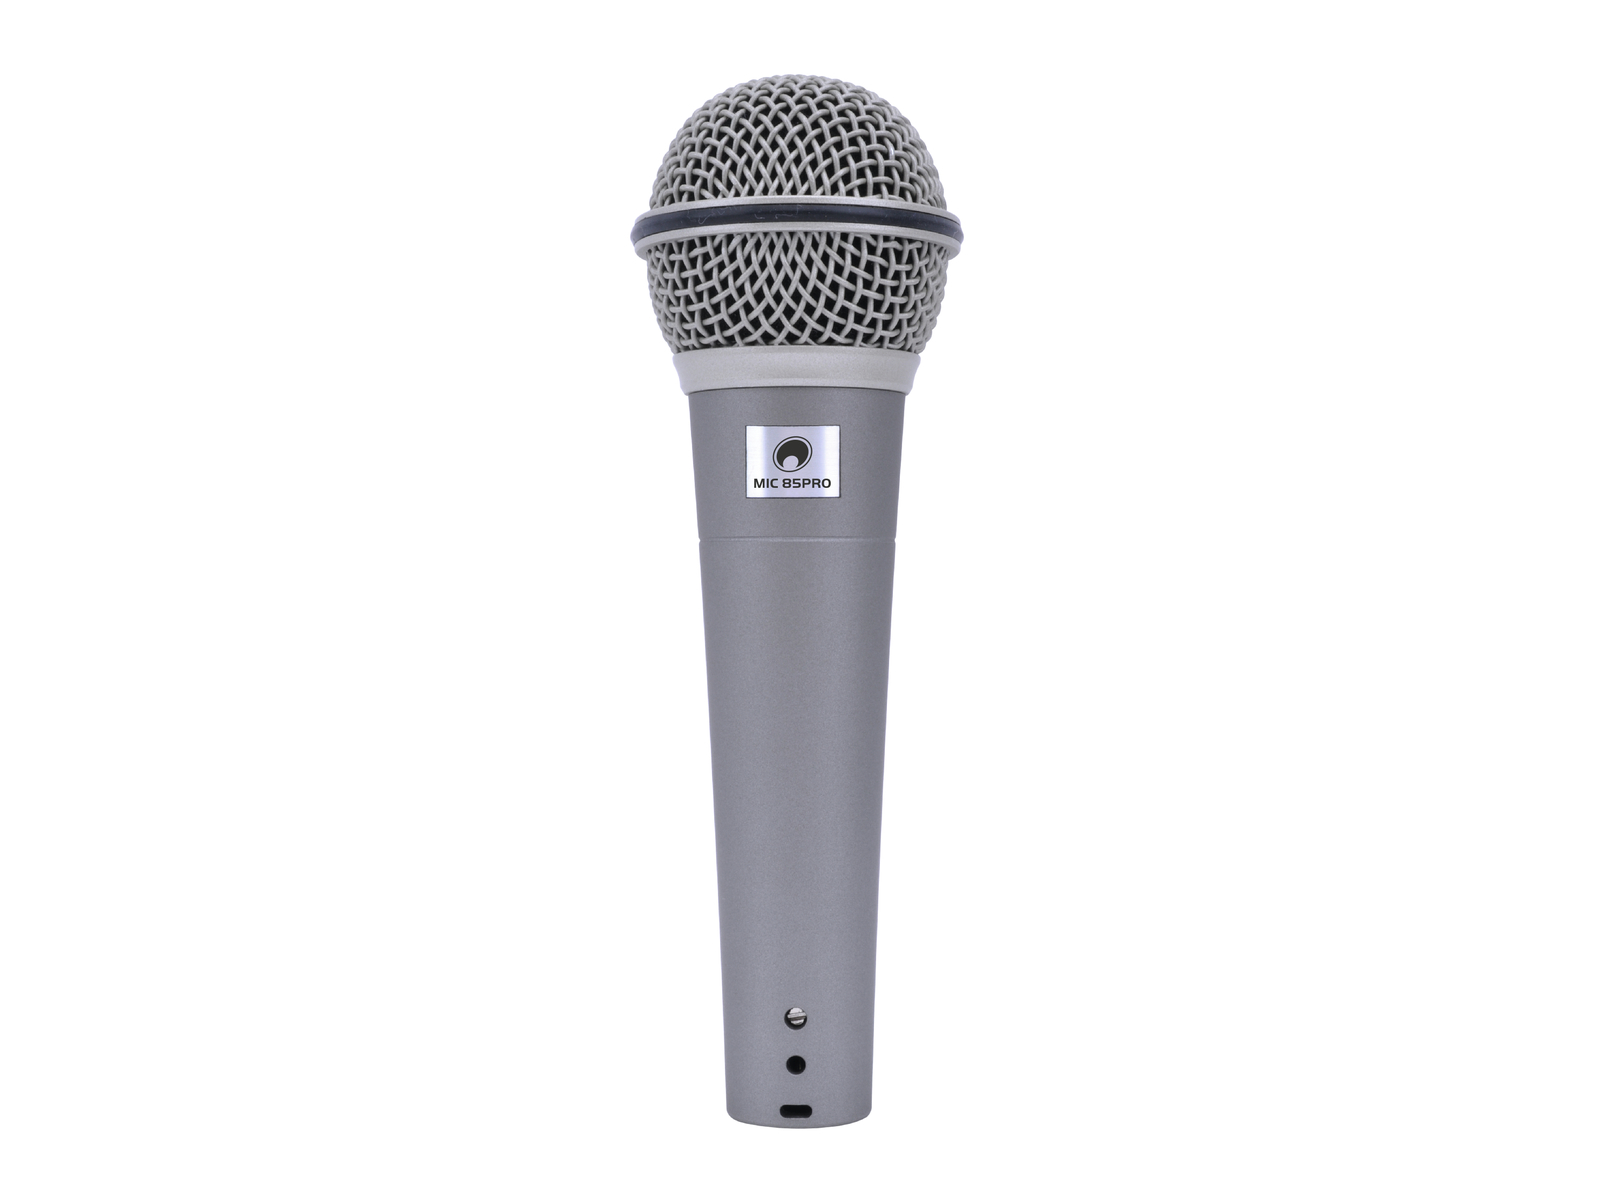 OMNITRONIC MIC 85PRO microfono Dinamico